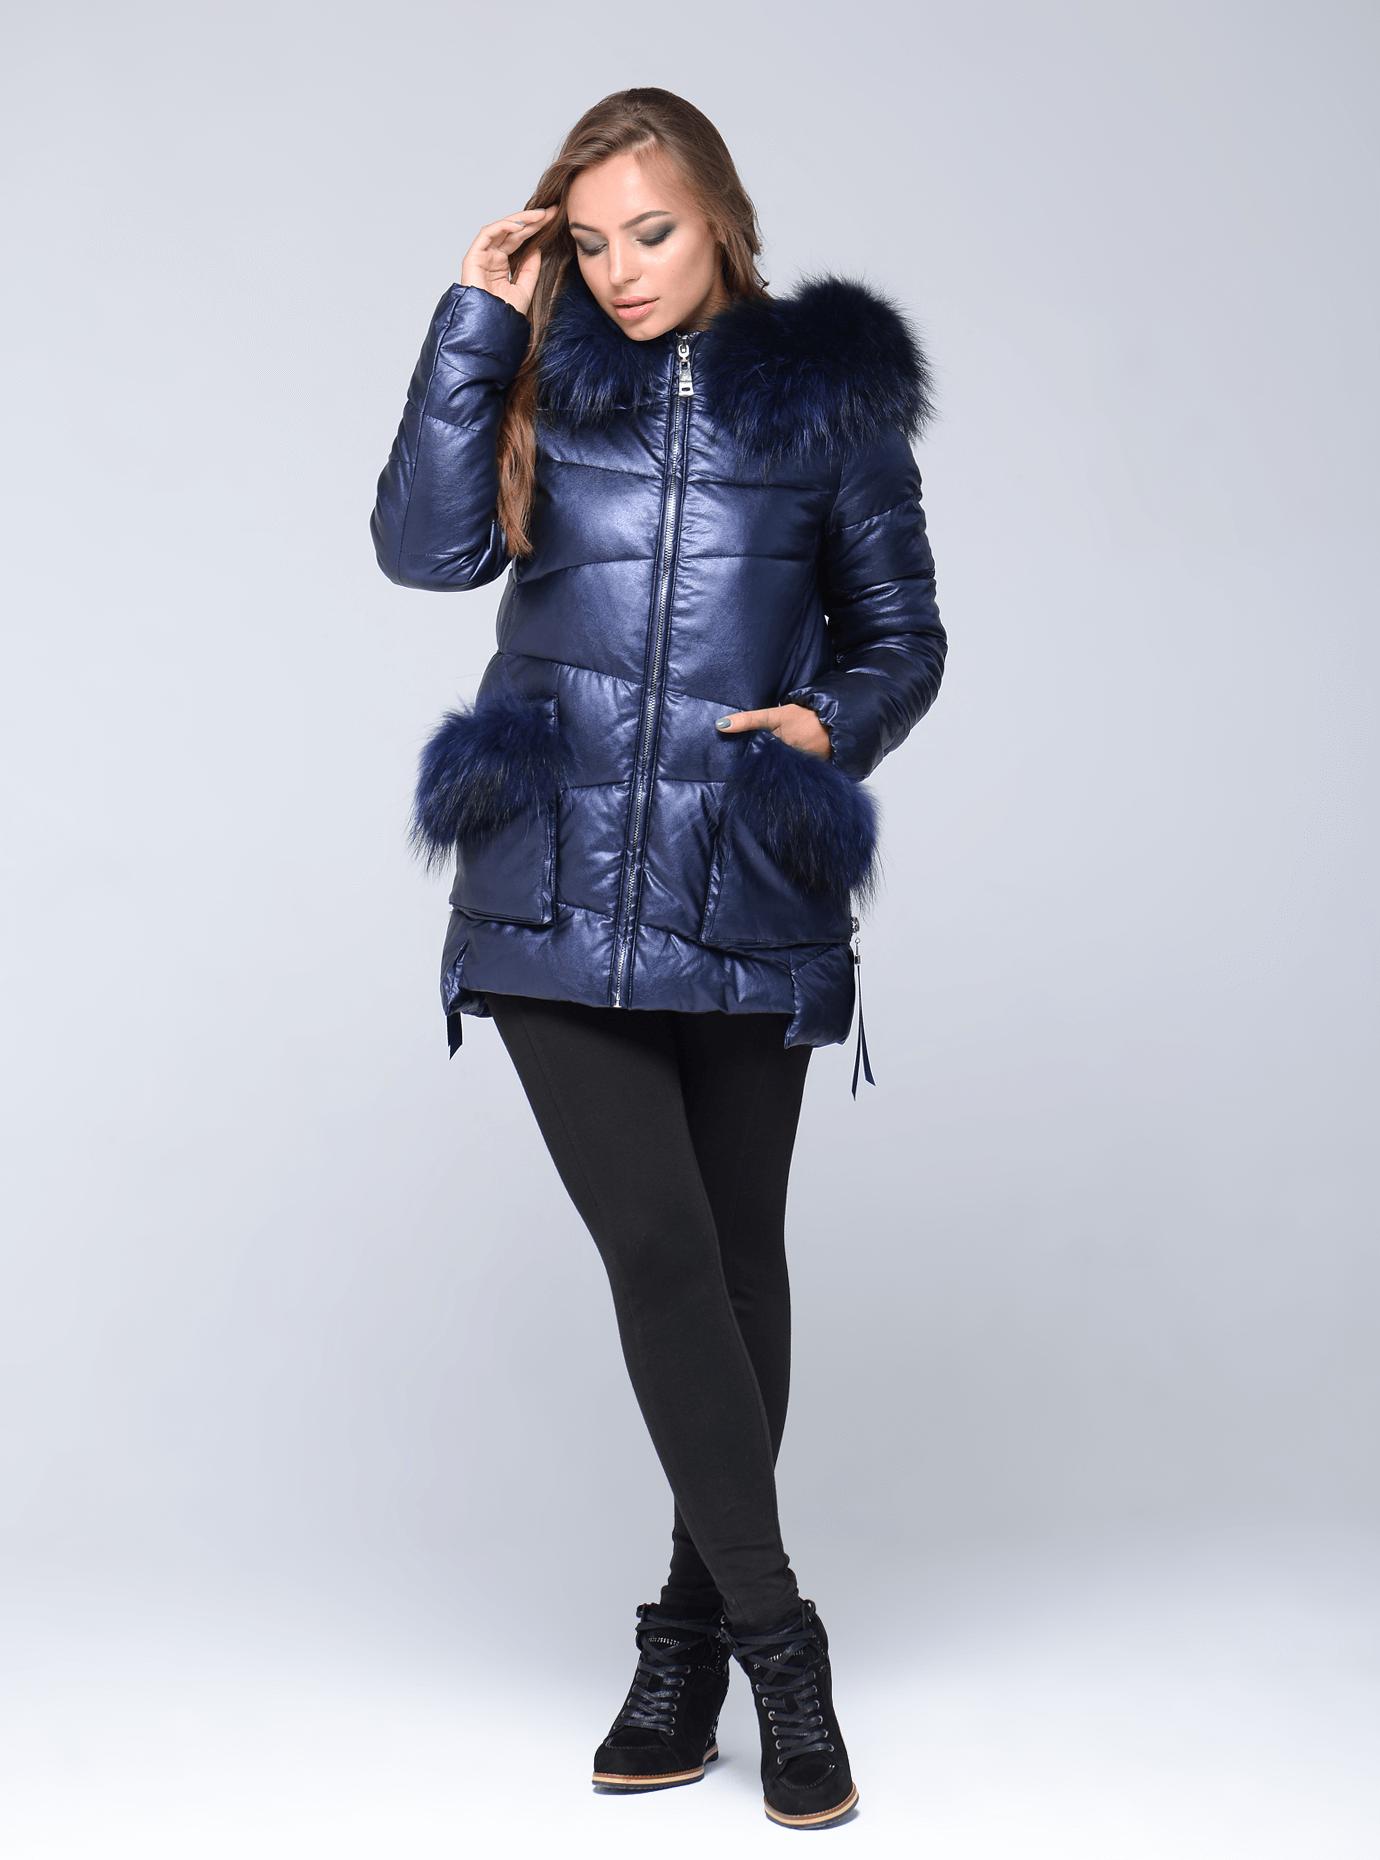 Куртка зимняя короткая с мехом енота Синий S (05-ZL2577): фото - Alster.ua